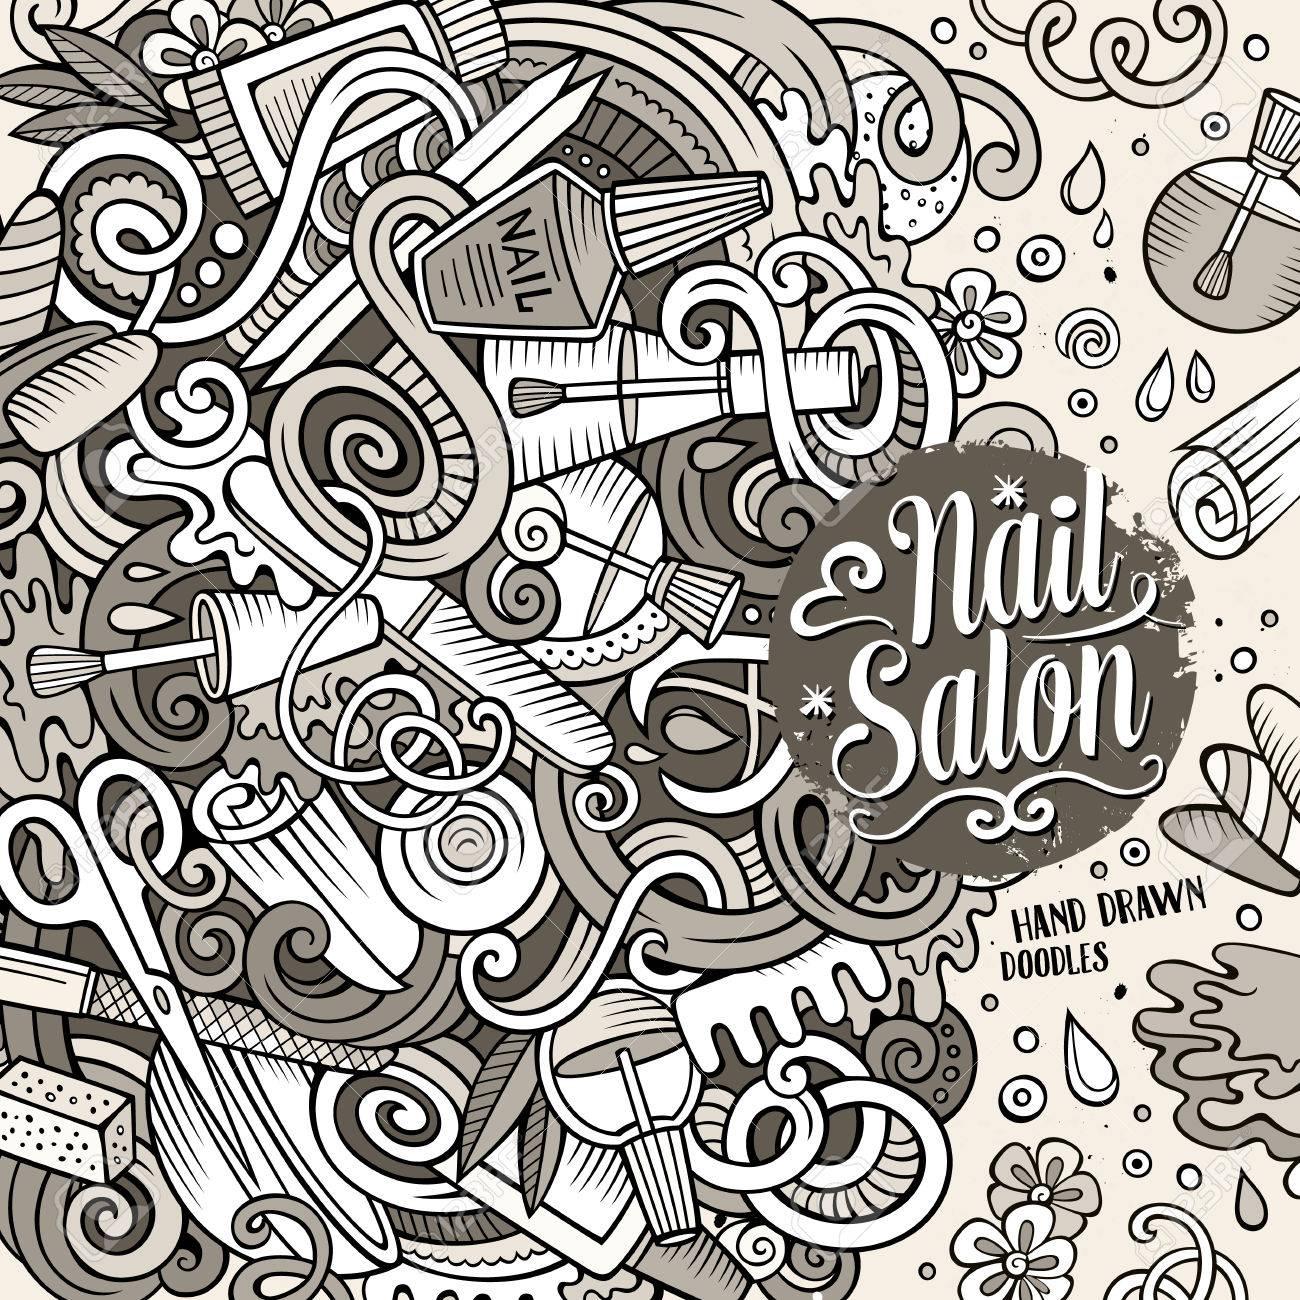 Cartoon Cute Doodles Drawn Nail Salon Frame Design. Sketchy Detailed ...